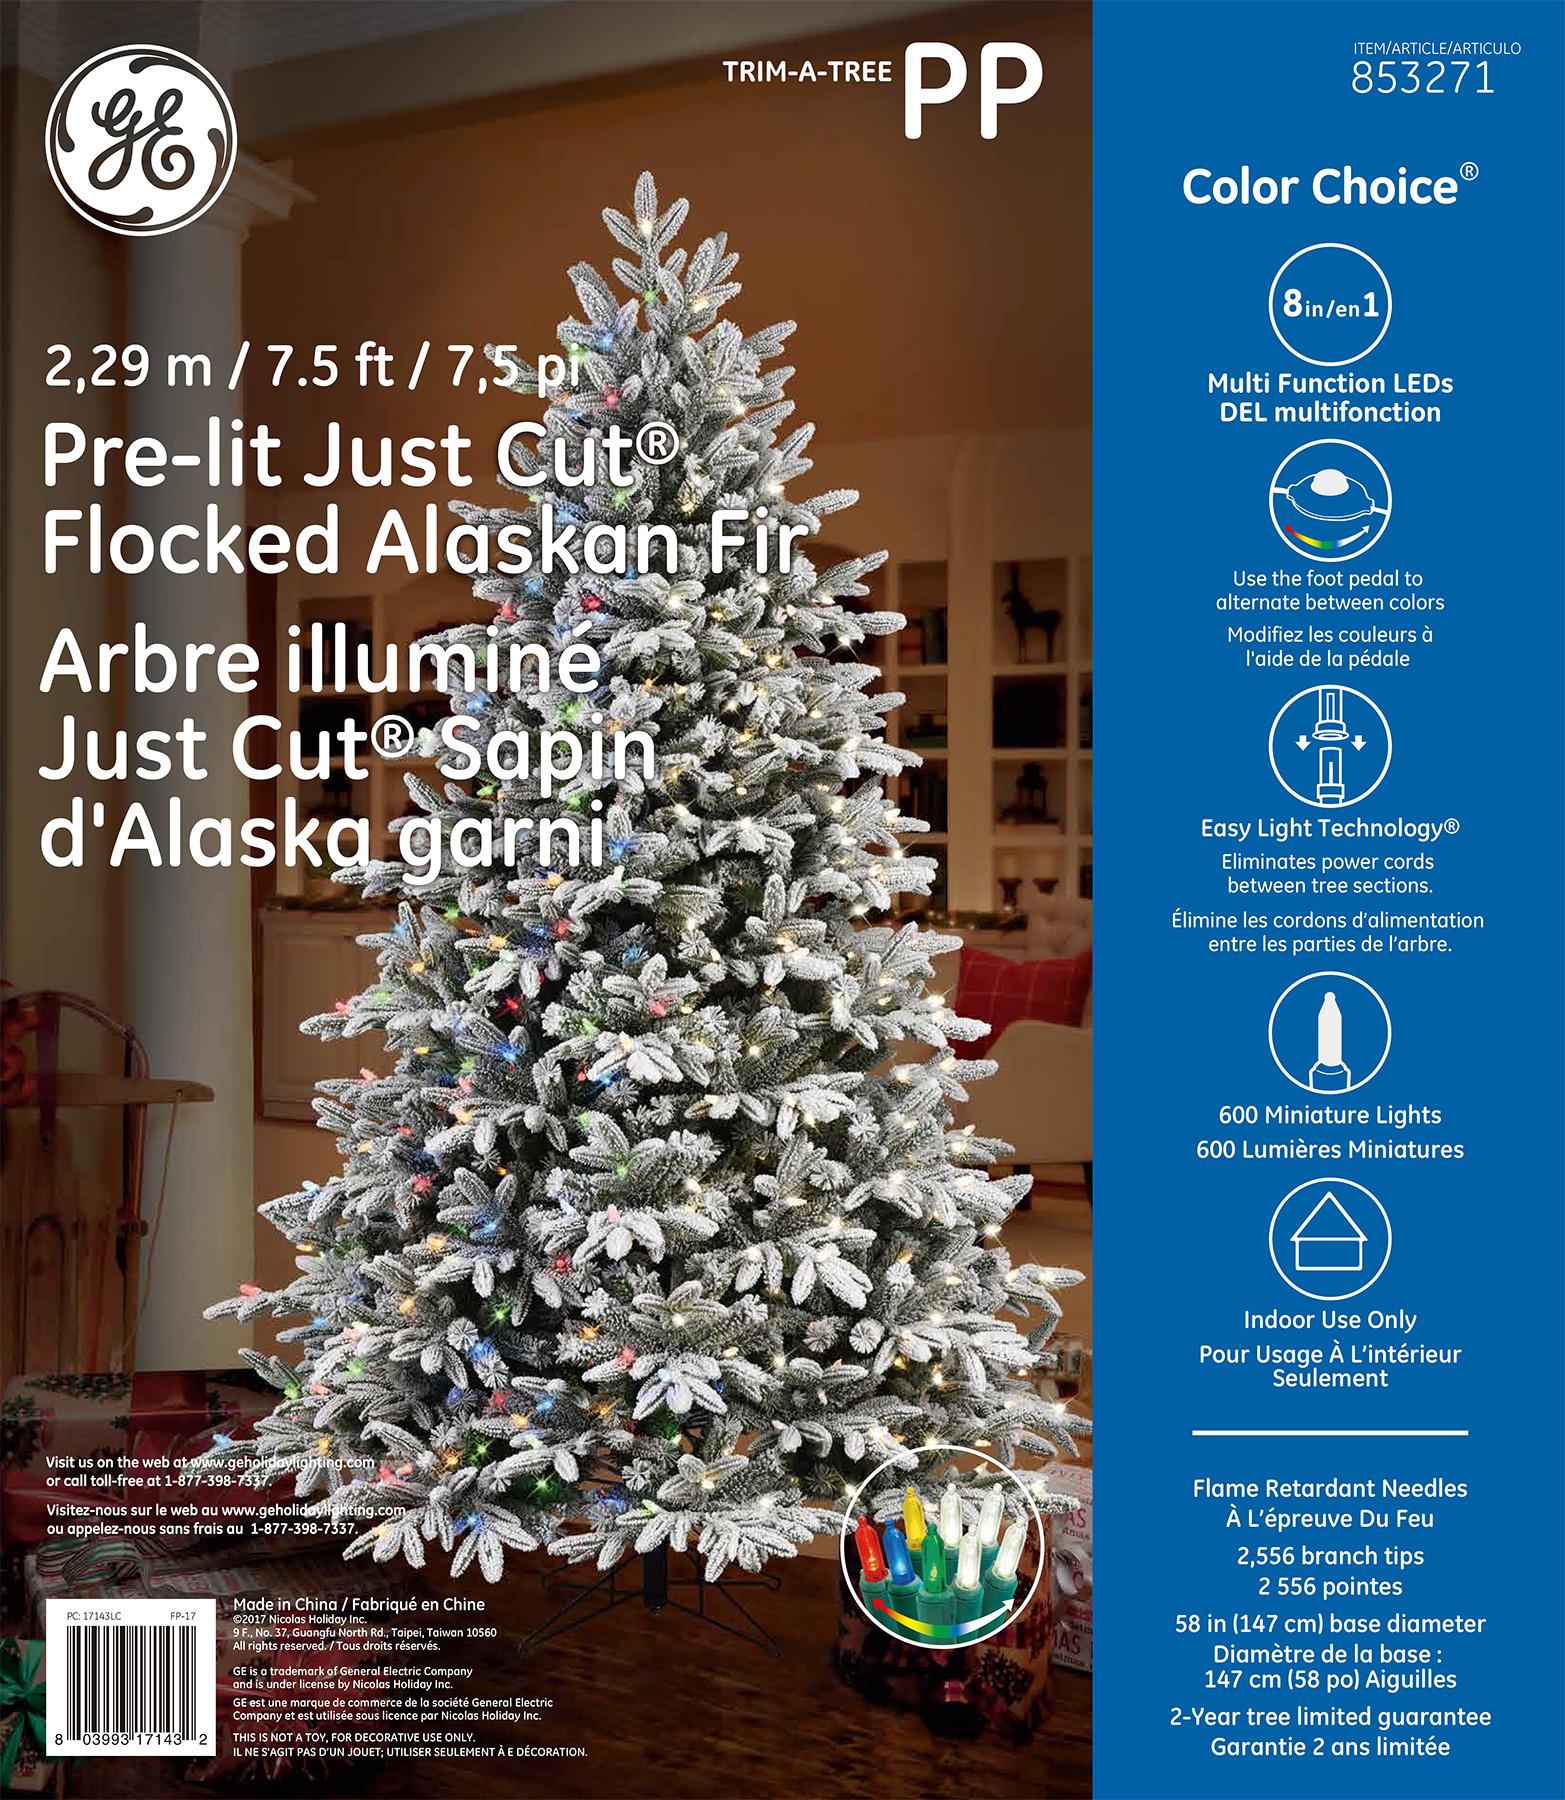 17143 - GE Just Cut® Flocked Alaskan Fir, 7.5 ft., Color Choice® LED, 600ct 7mm Lights, Warm ...